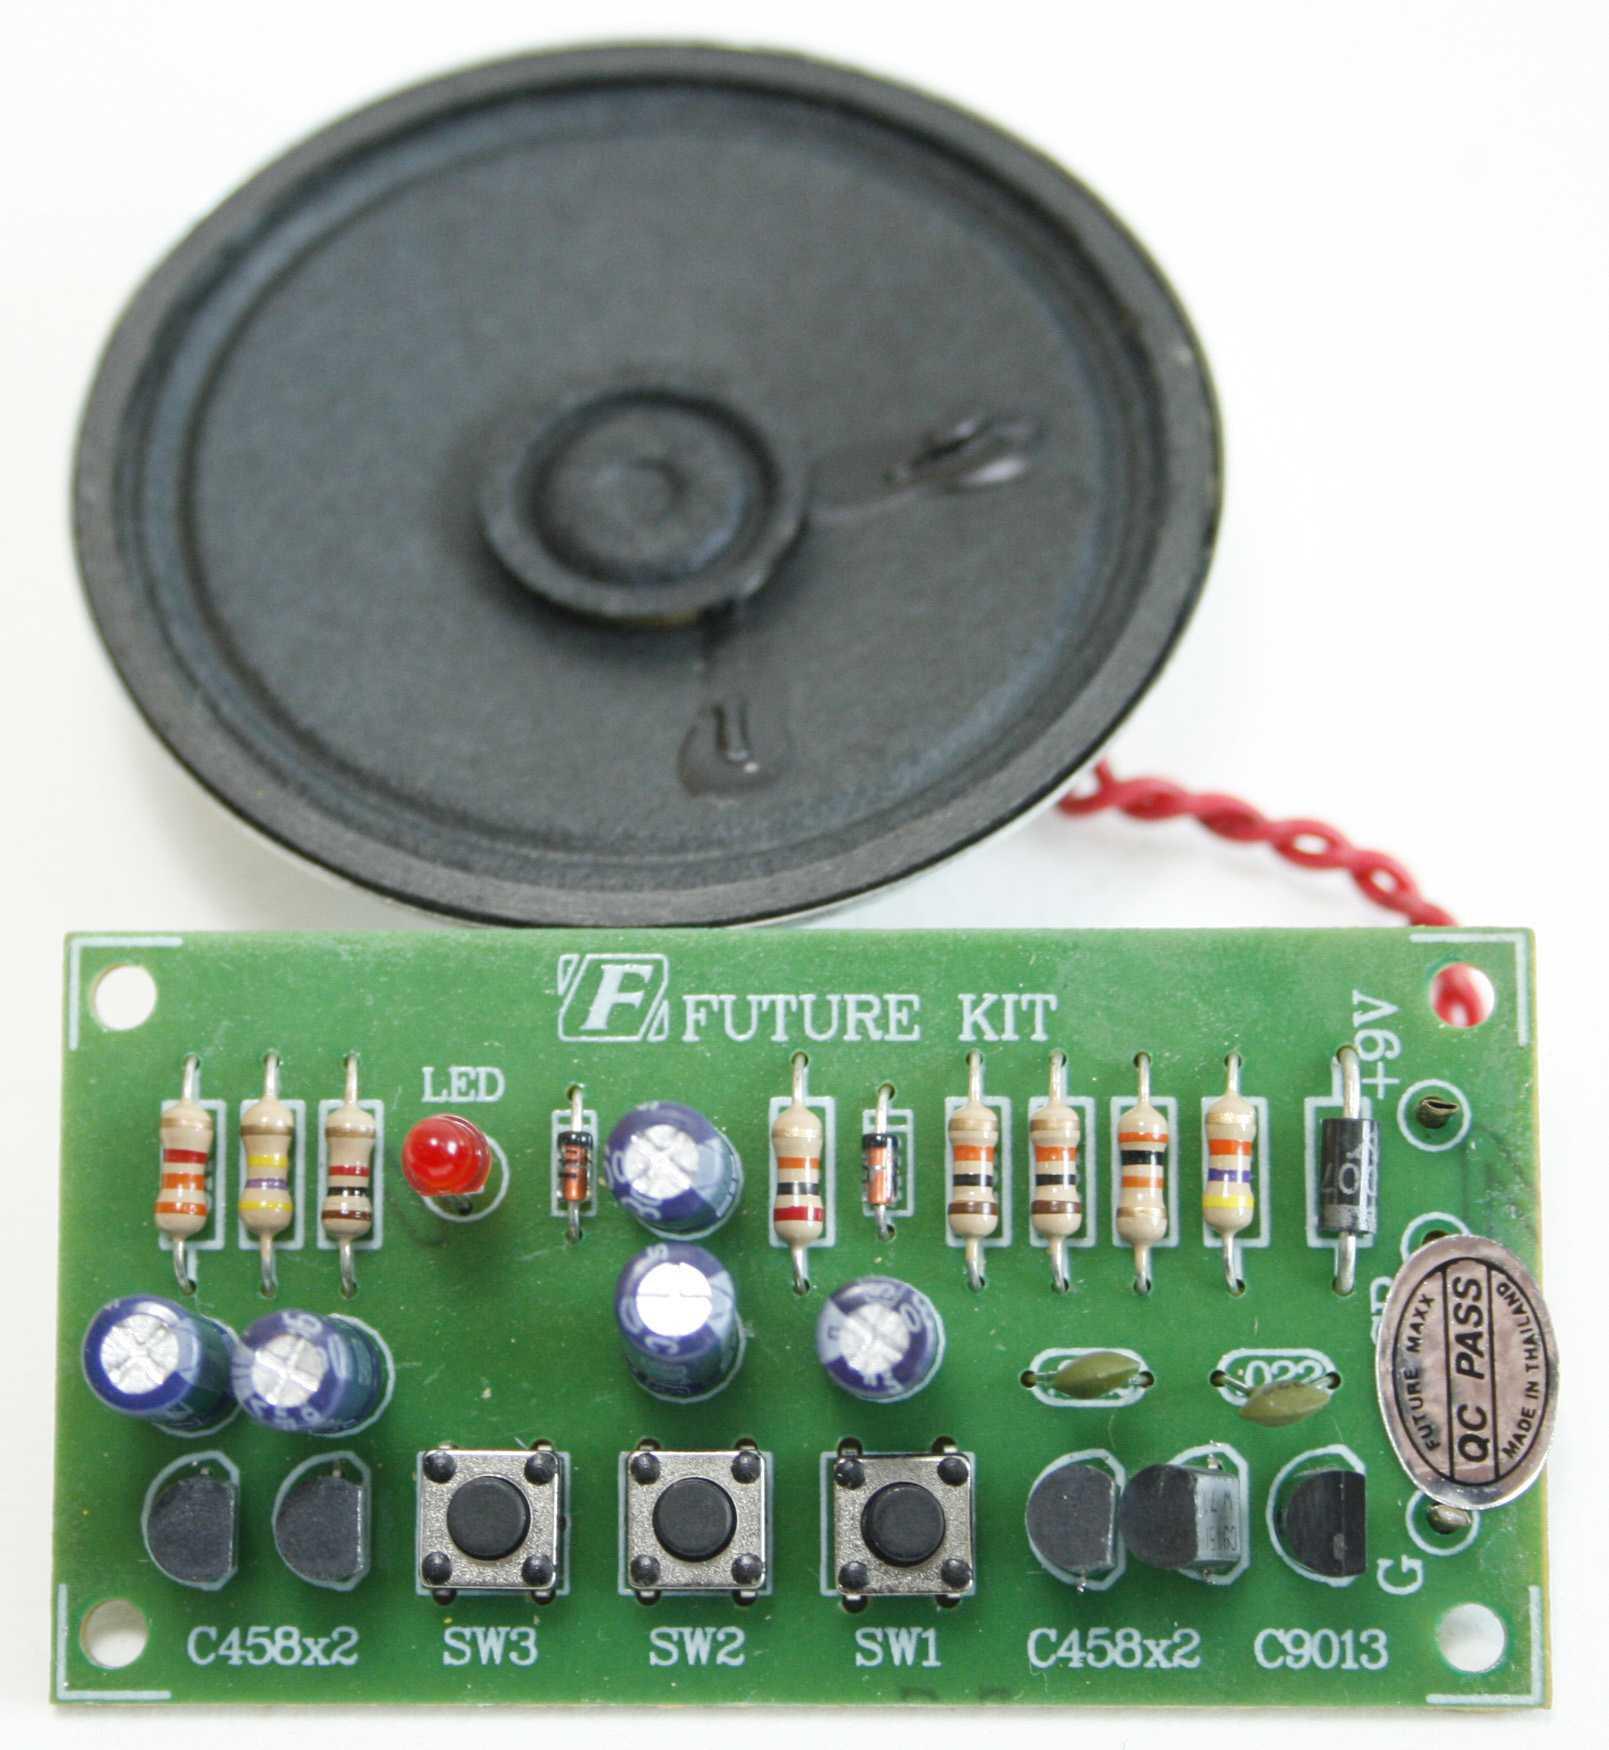 Fk272 Space Gun 3 Tone Electronic Circuit Design Review